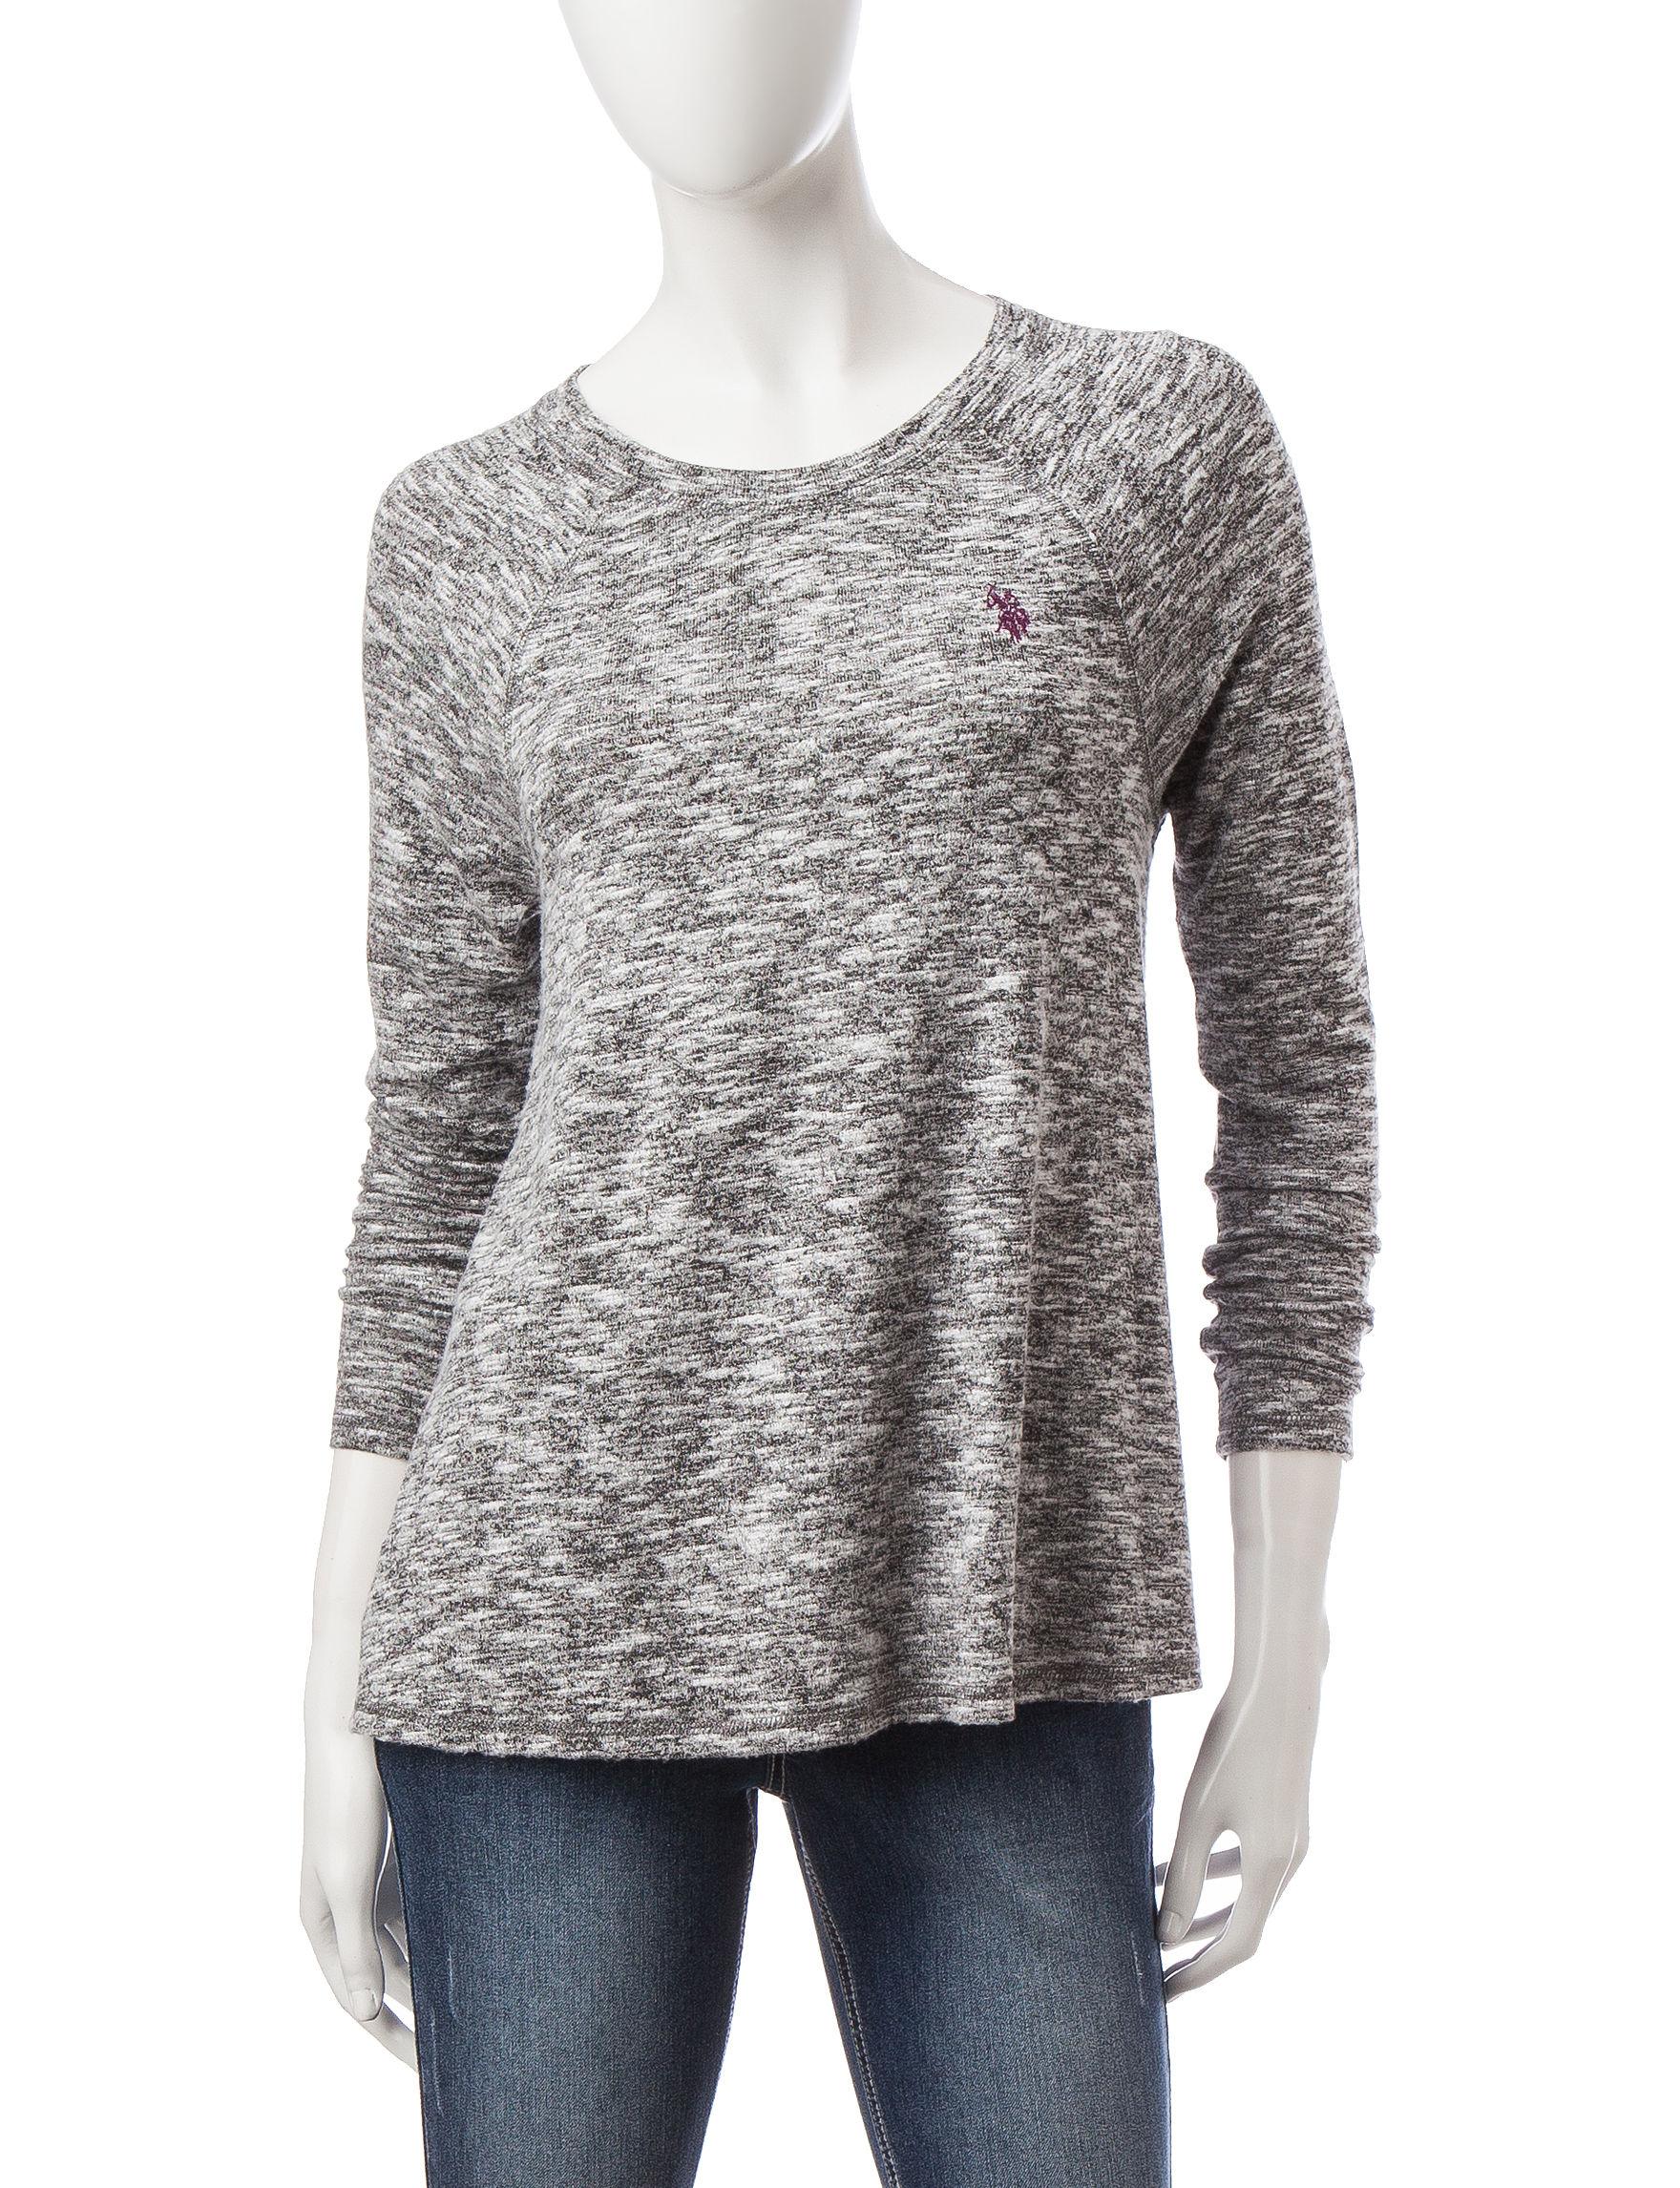 U.S. Polo Assn. Dark Grey Pull-overs Sweaters